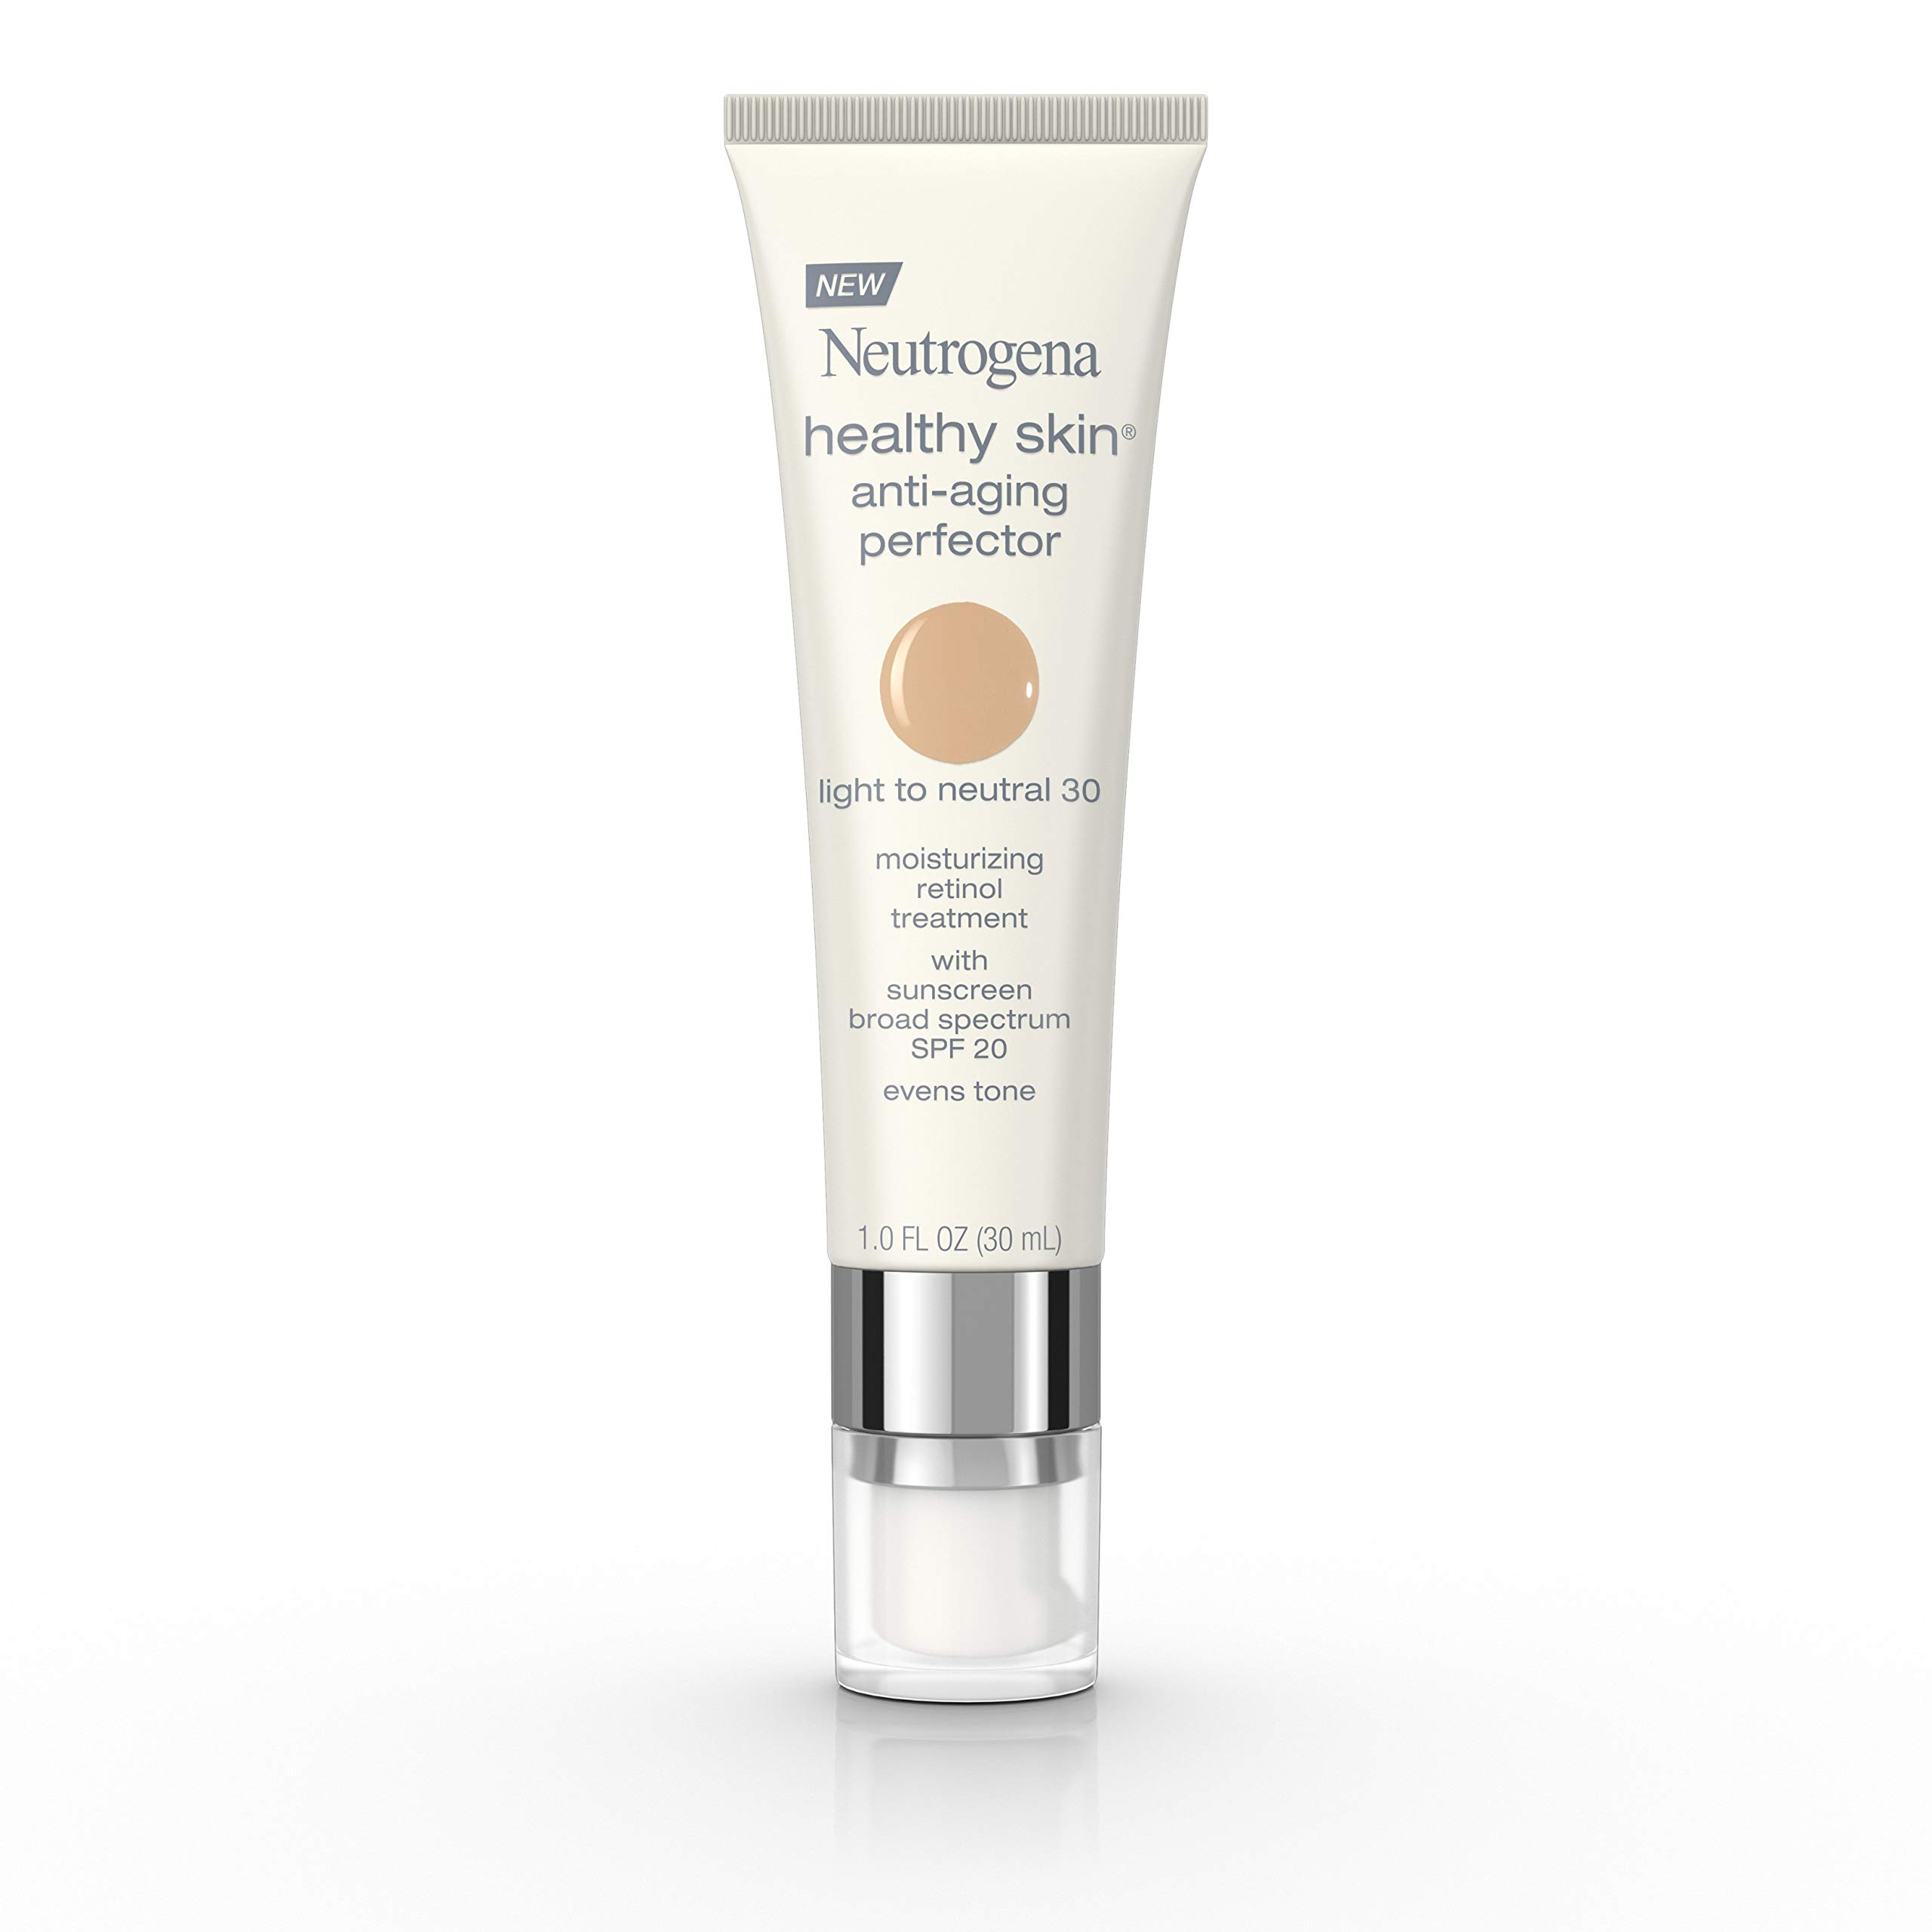 Neutrogena Healthy Skin Anti-Aging Perfector Spf 20, Retinol Treatment, 30 Light To Neutral, 1 Fl. Oz. by Neutrogena